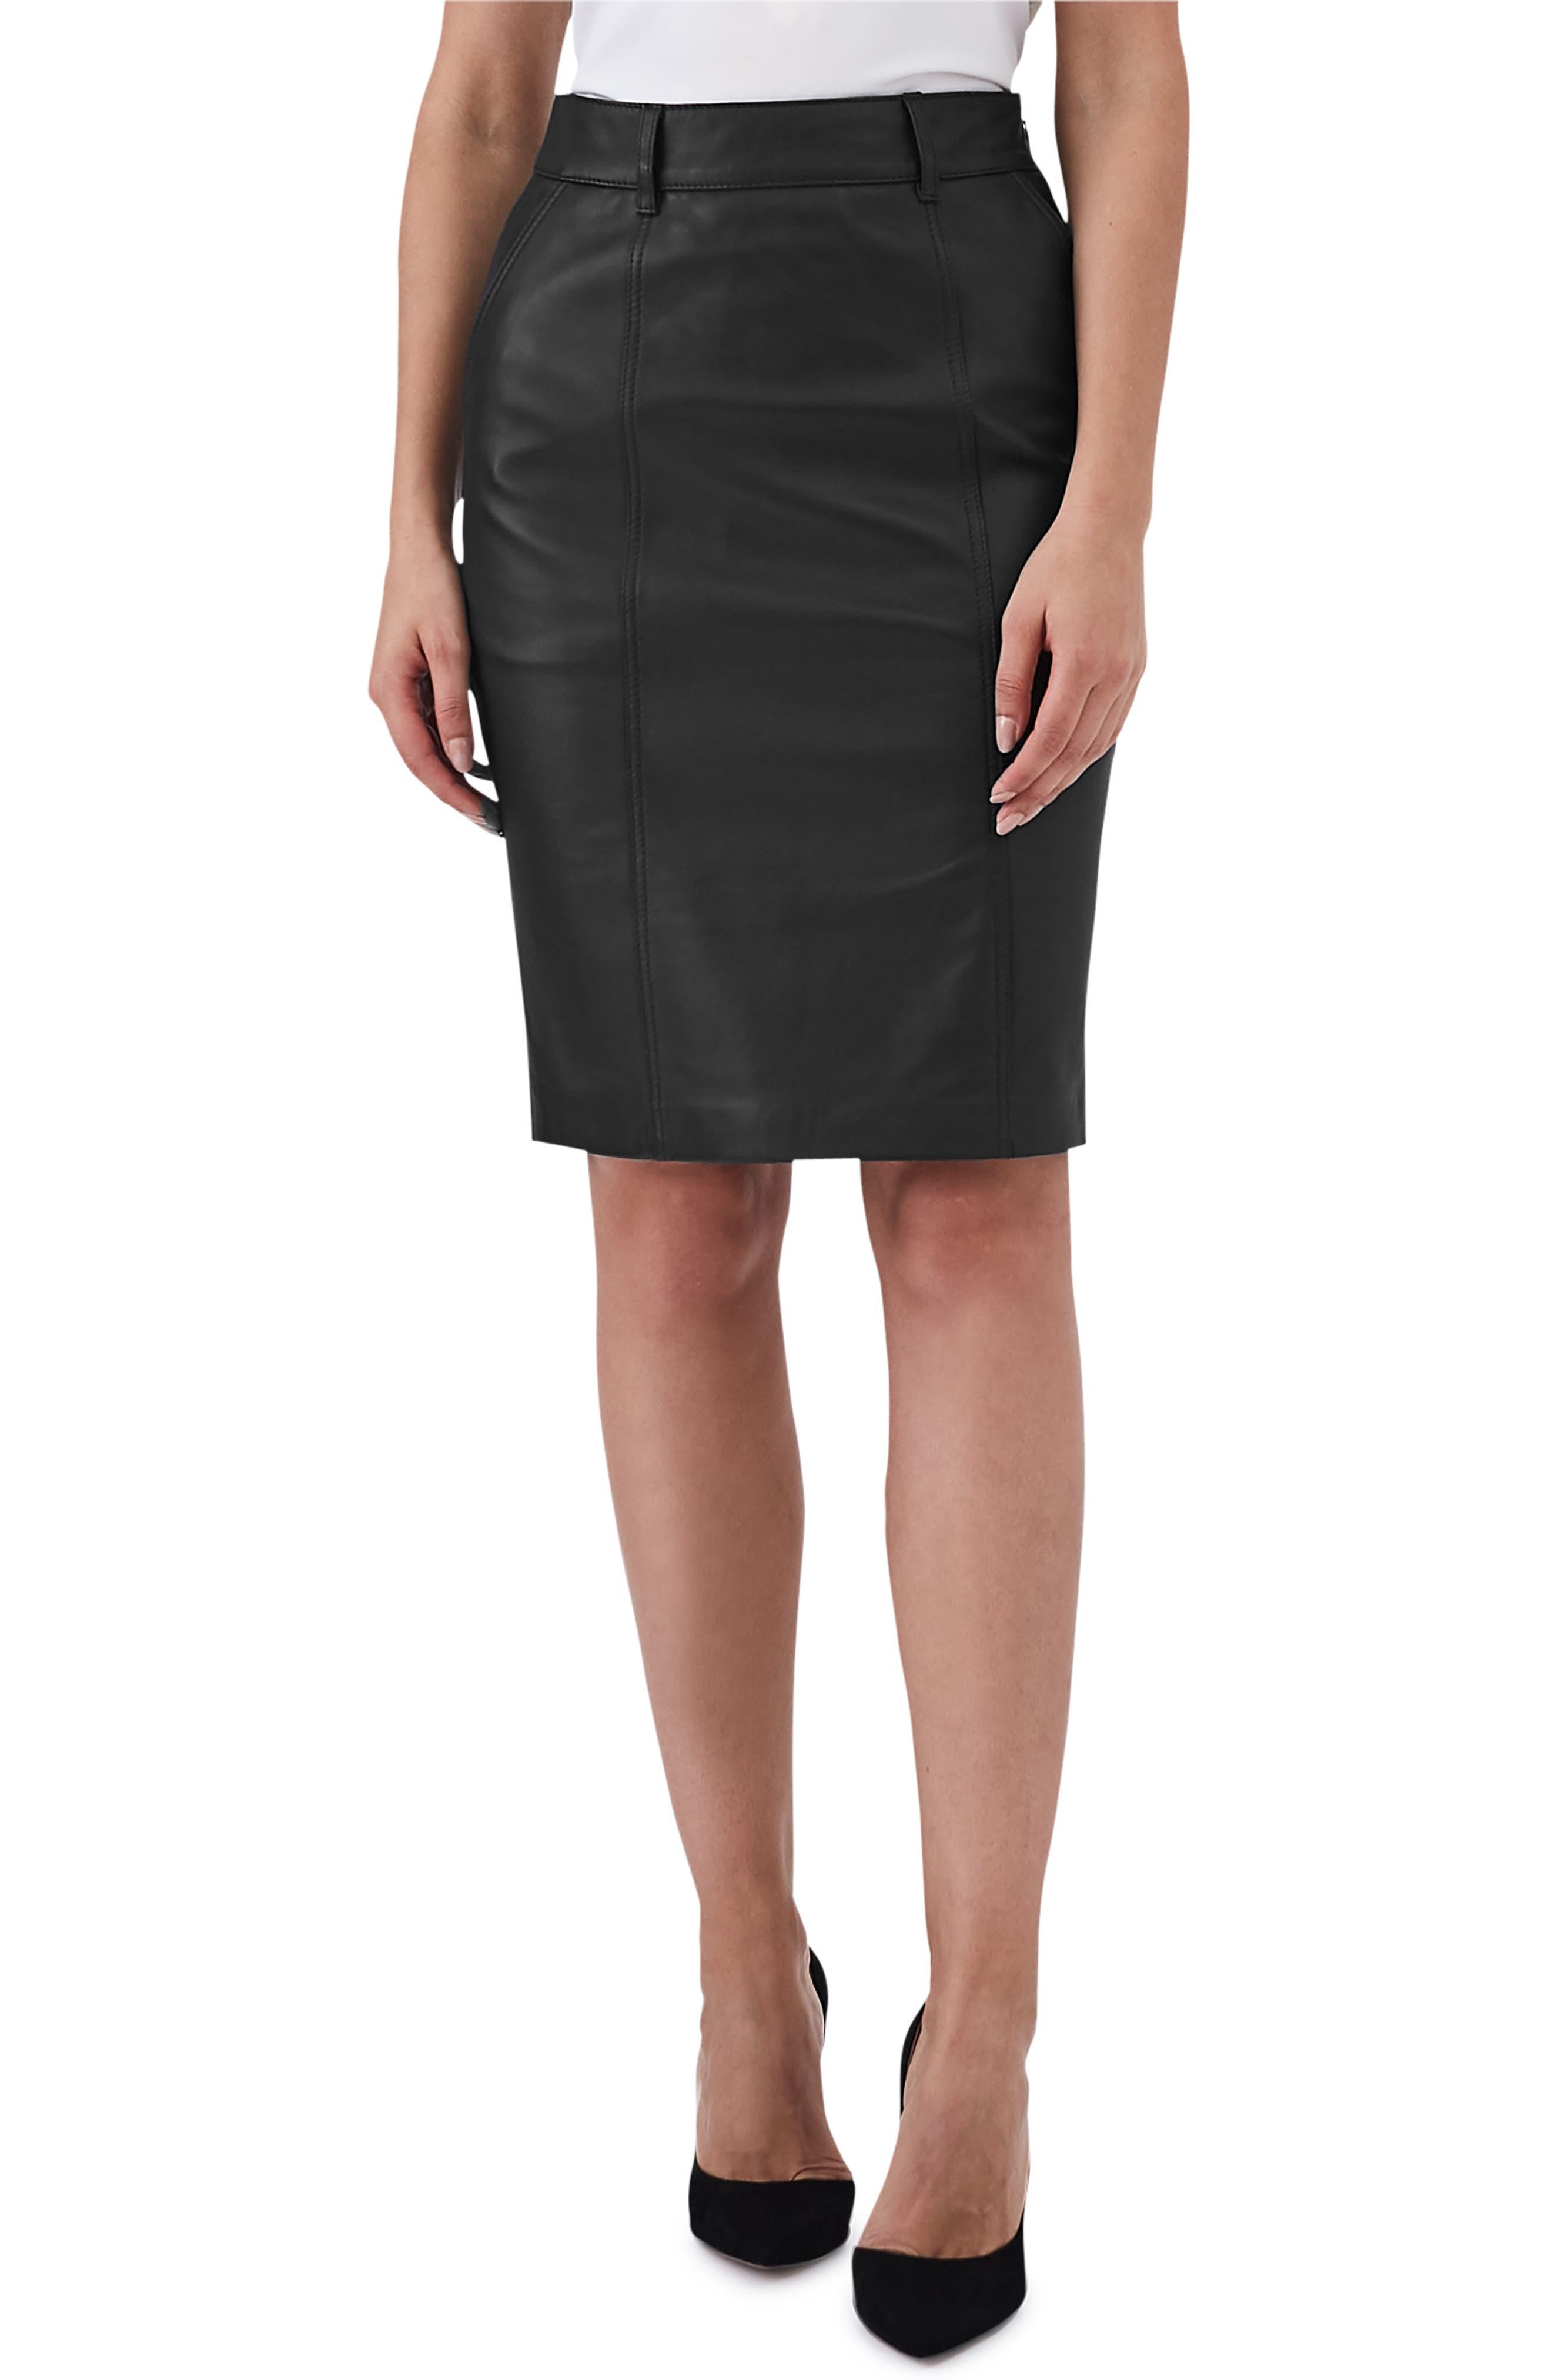 Kara Leather Pencil Skirt,                             Main thumbnail 1, color,                             BLACK